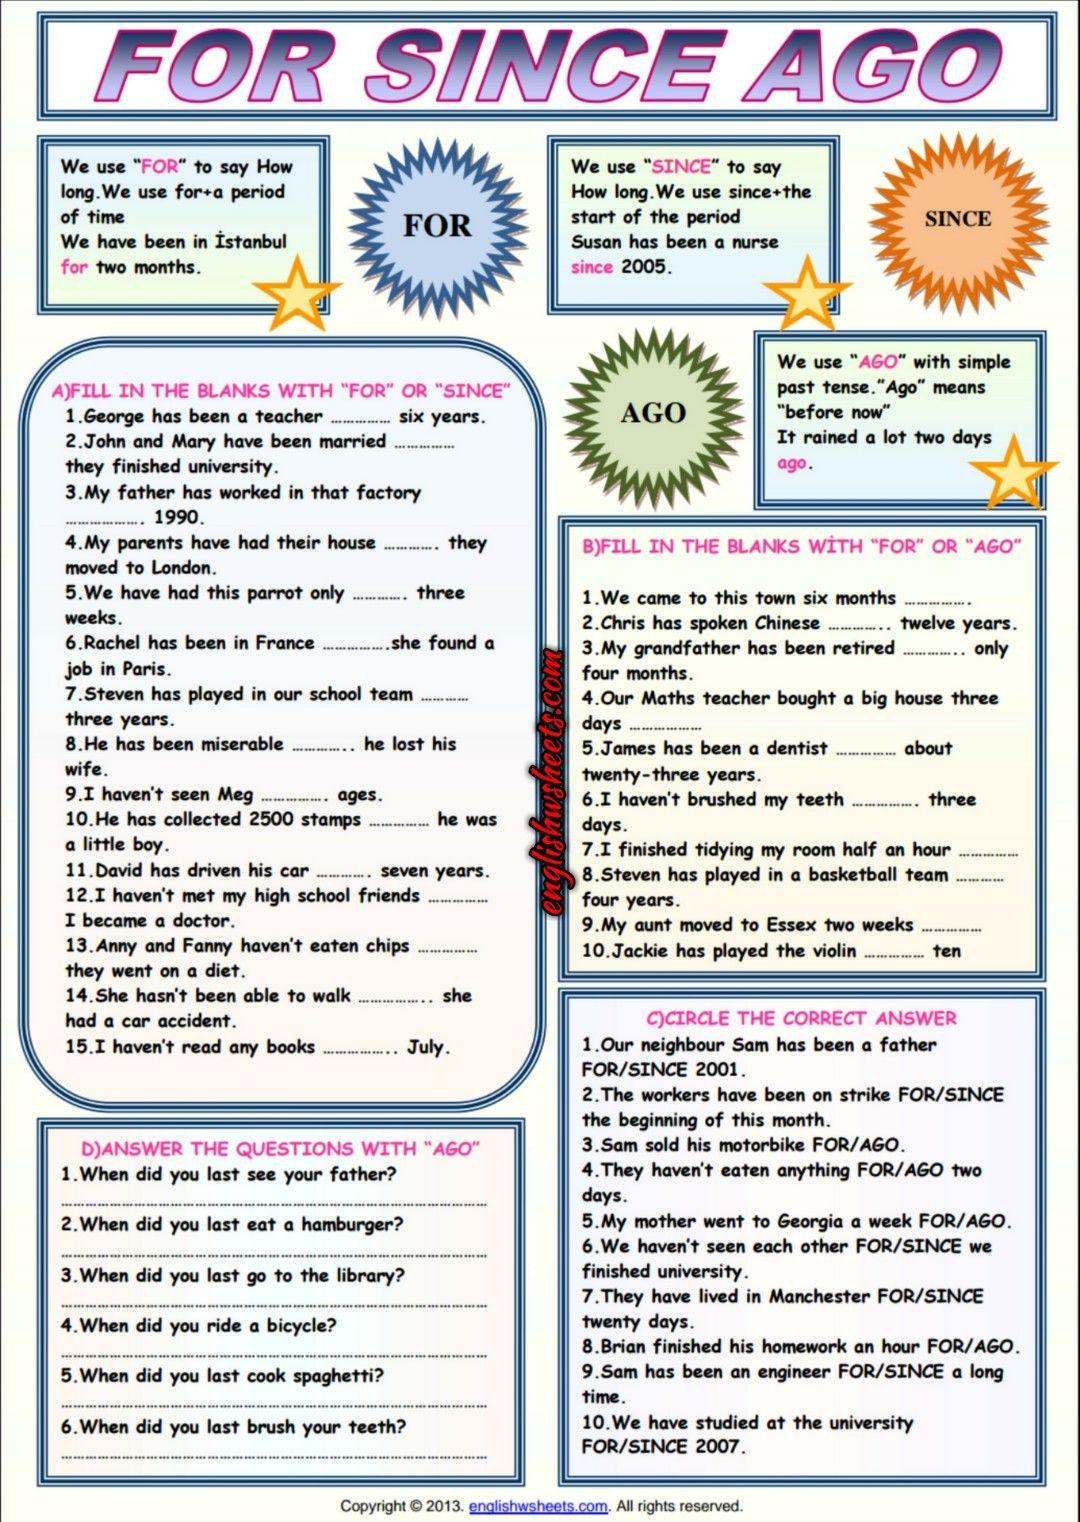 For Since Ago ESL Grammar Exercises Worksheet | english news words ...